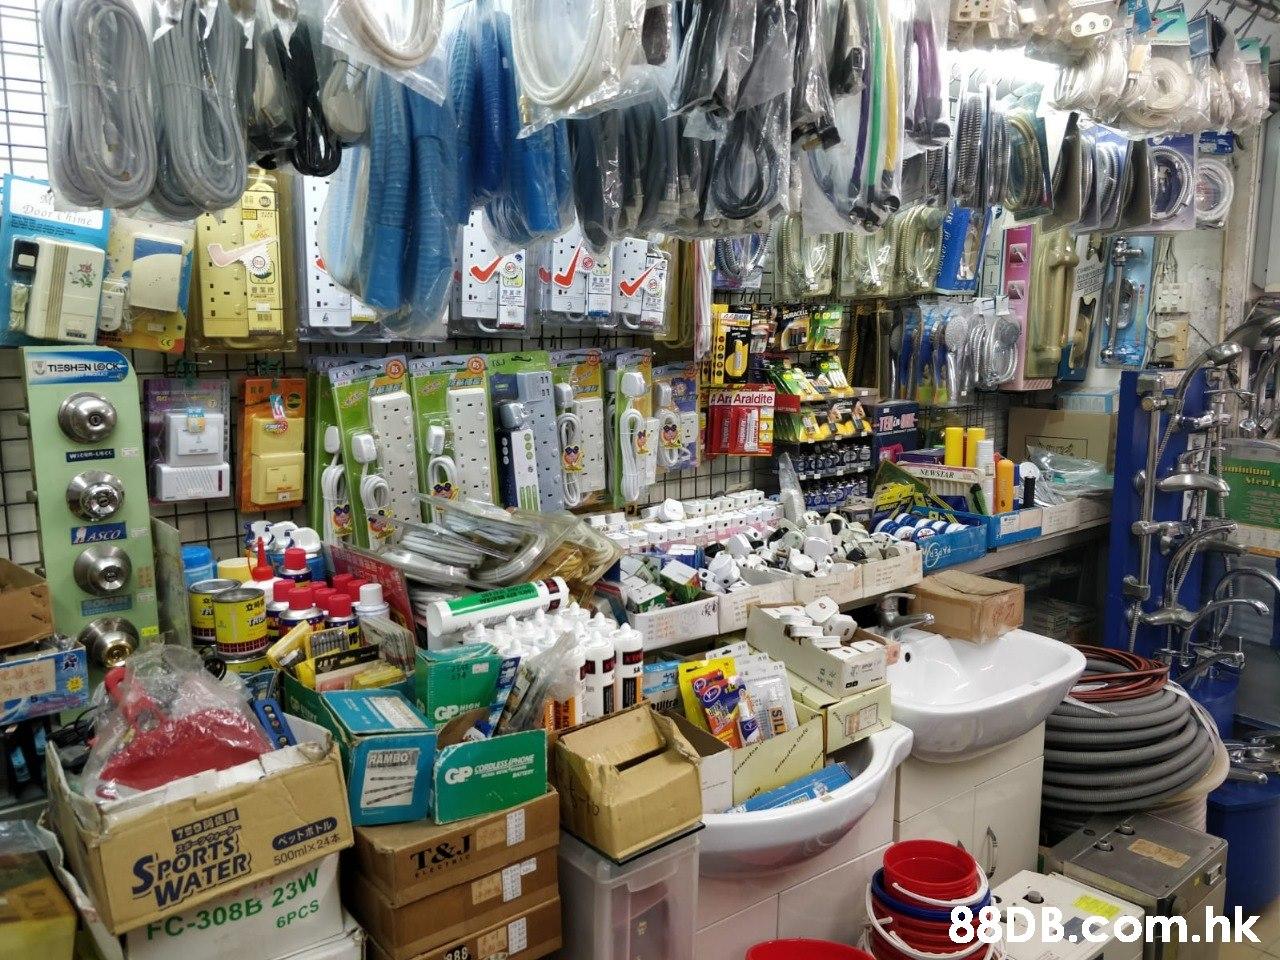 Door Chimeと TIESHEN LOCK Ar Araldite LASCO minium CPHON RAMBO SPORTS WATER 500mix24 ベットボトル FC-308B 23W 6PCS T&J .hk  Product,Selling,Marketplace,Market,Building